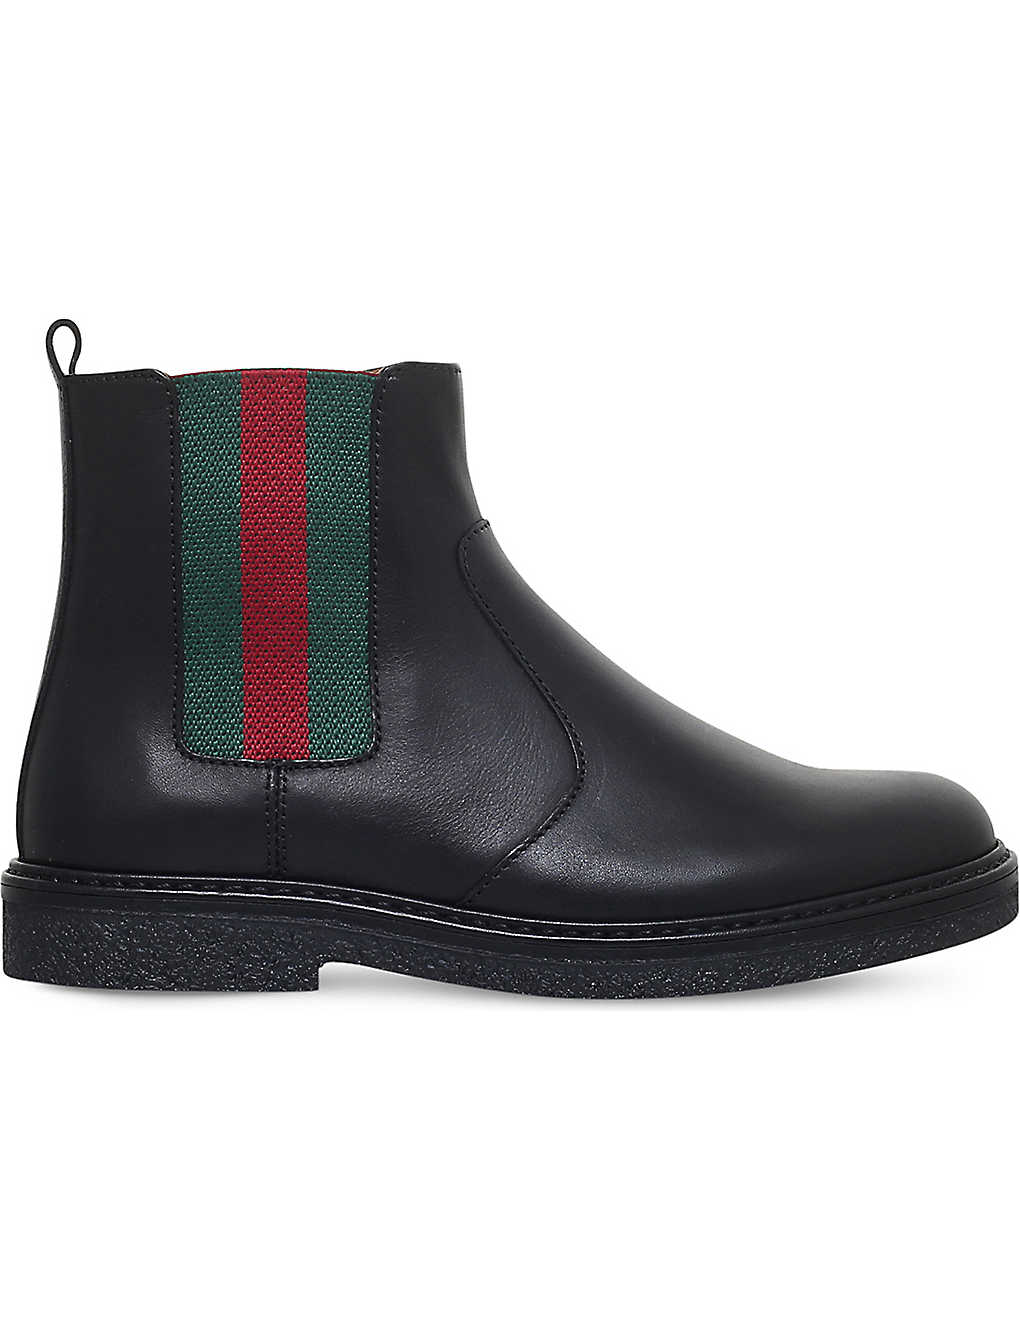 46ba62289 GUCCI - Joshua leather chelsea boots 4-8 years | Selfridges.com